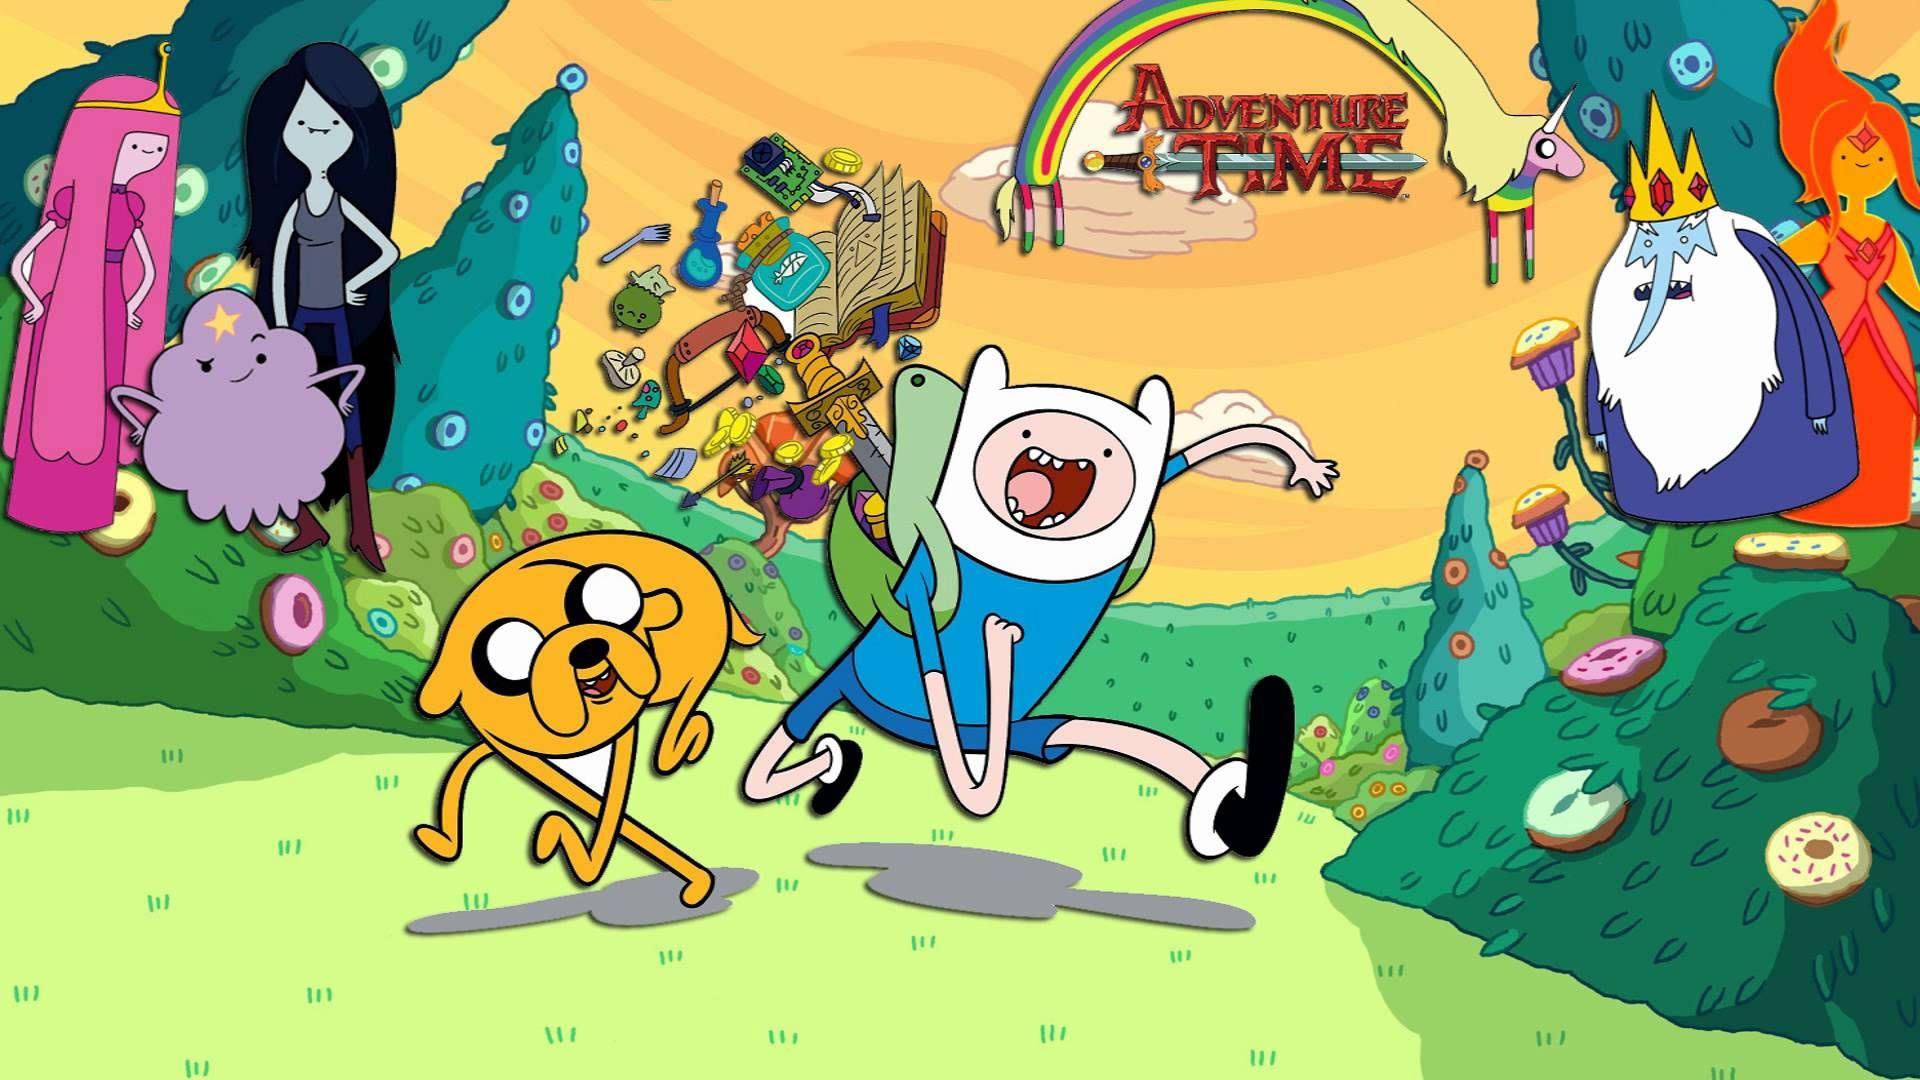 Adventure Time Wallpaper Adventure Time Wallpaper Adventure Time Cartoon Adventure Time Movie